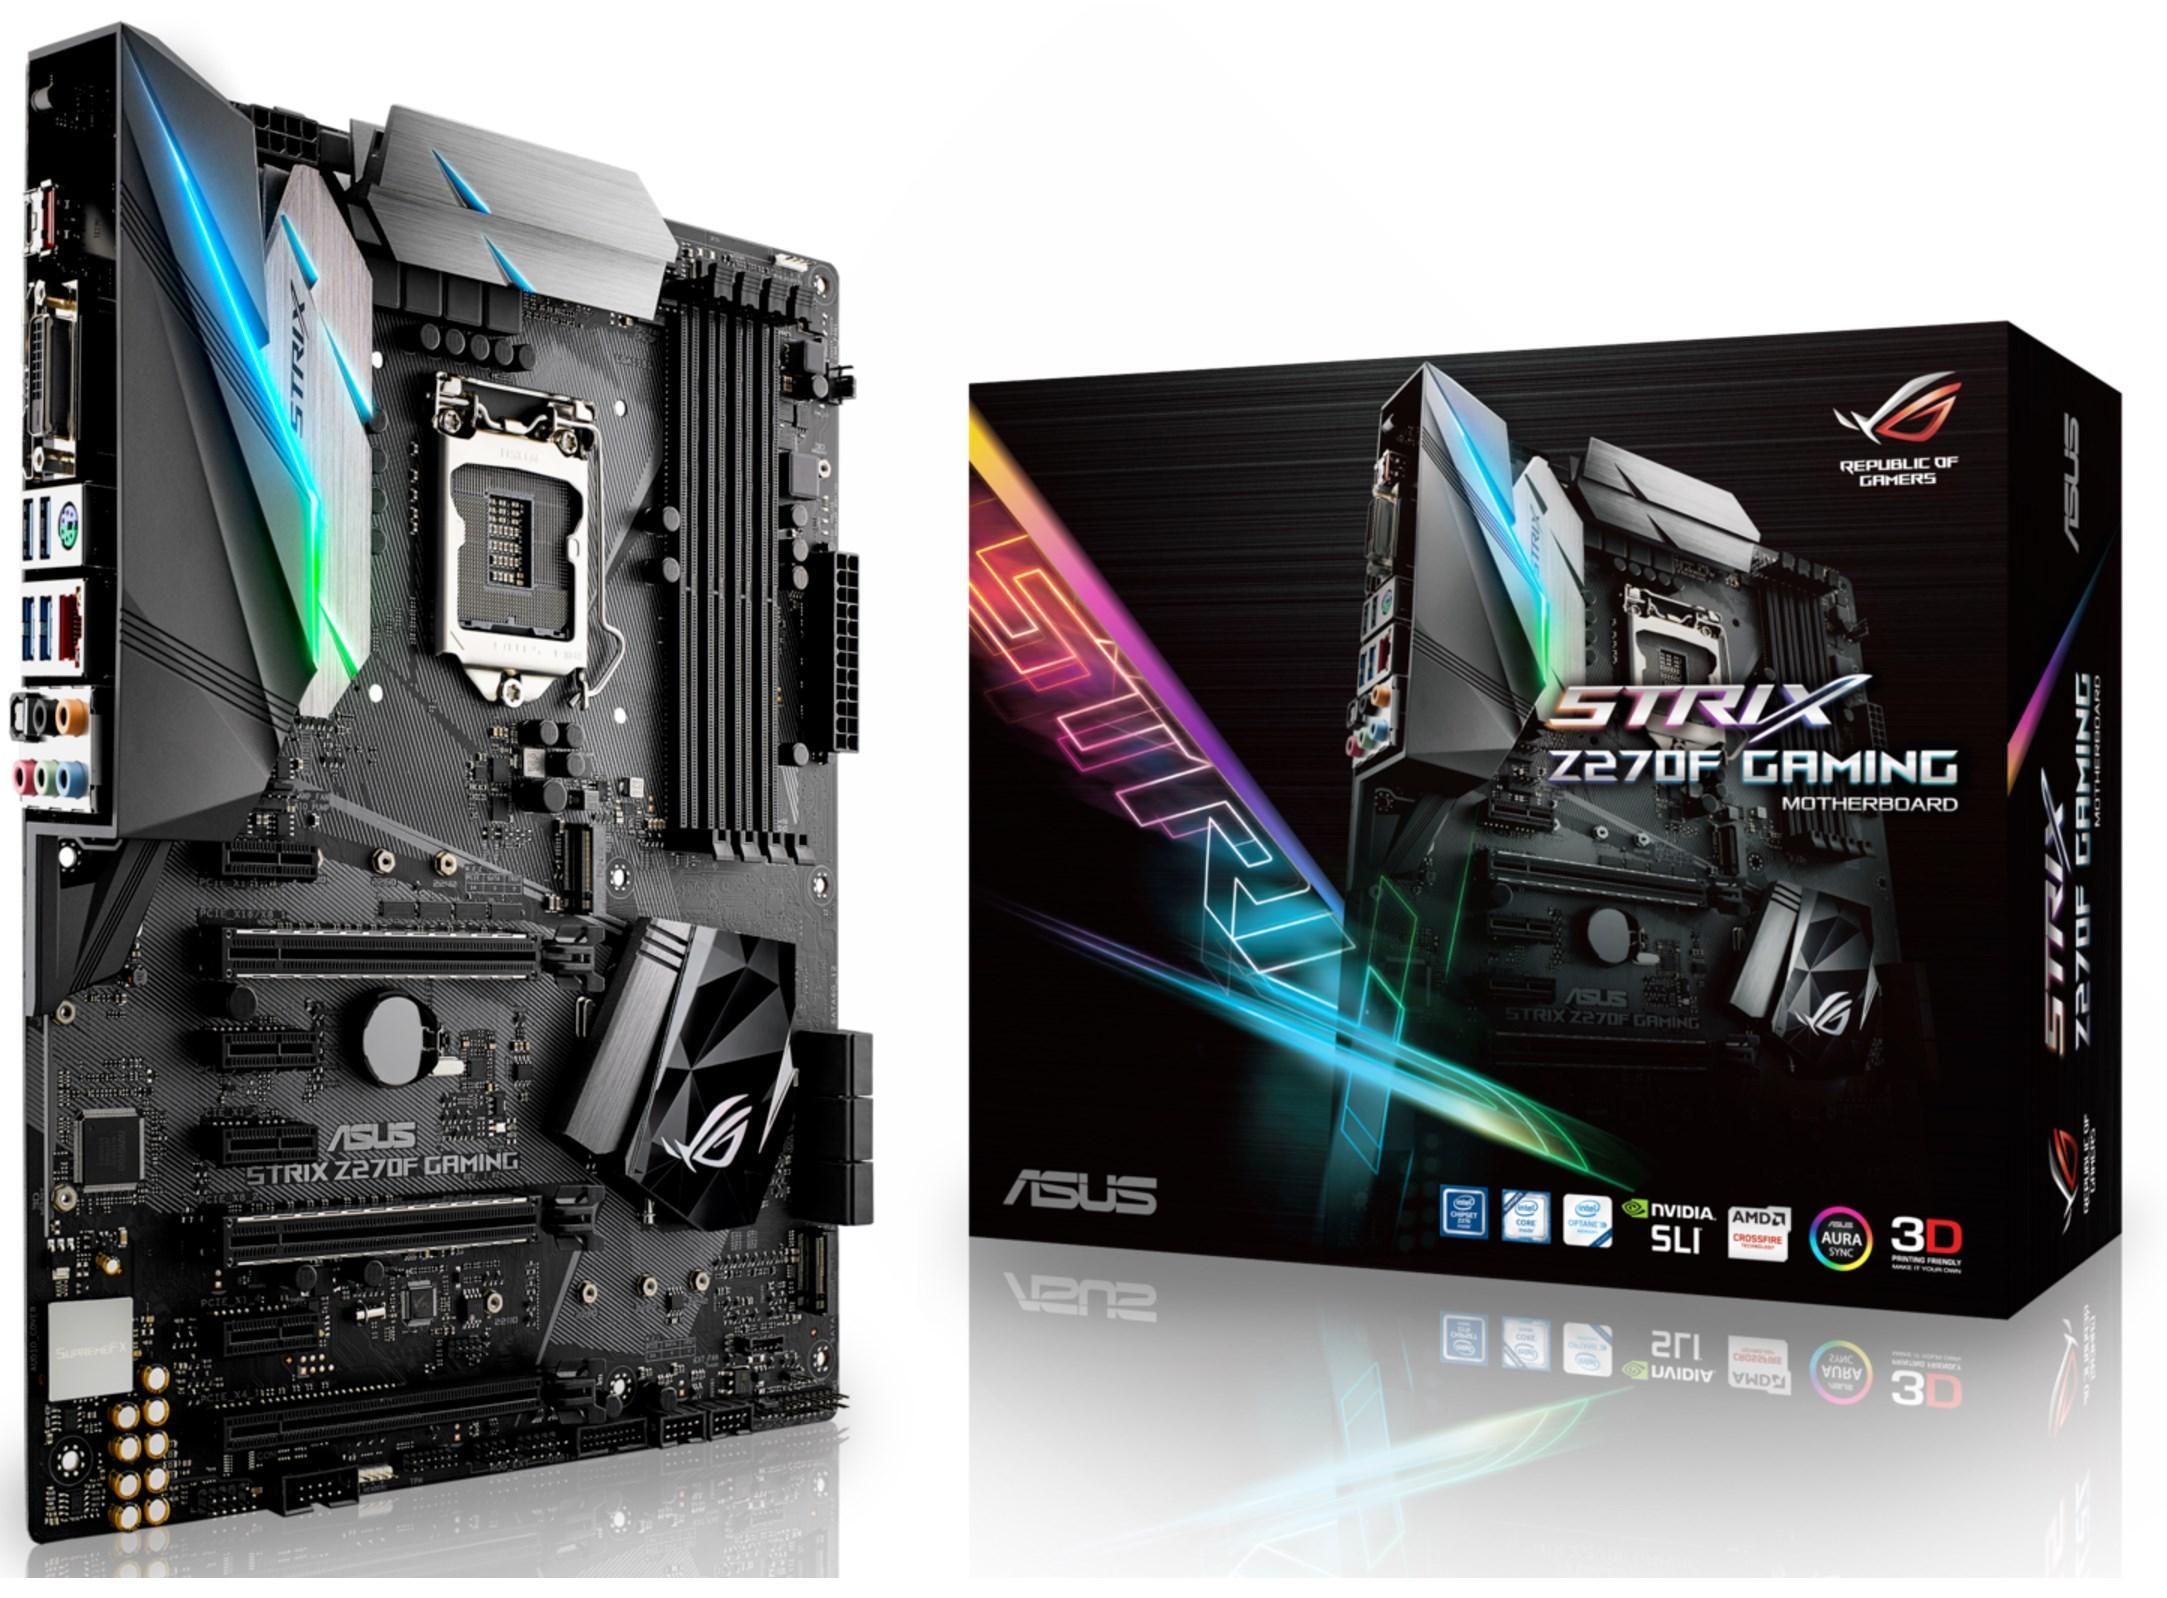 Carte mère Asus Strix Z270F Gaming - Socket 1151, Z270 Kabylake